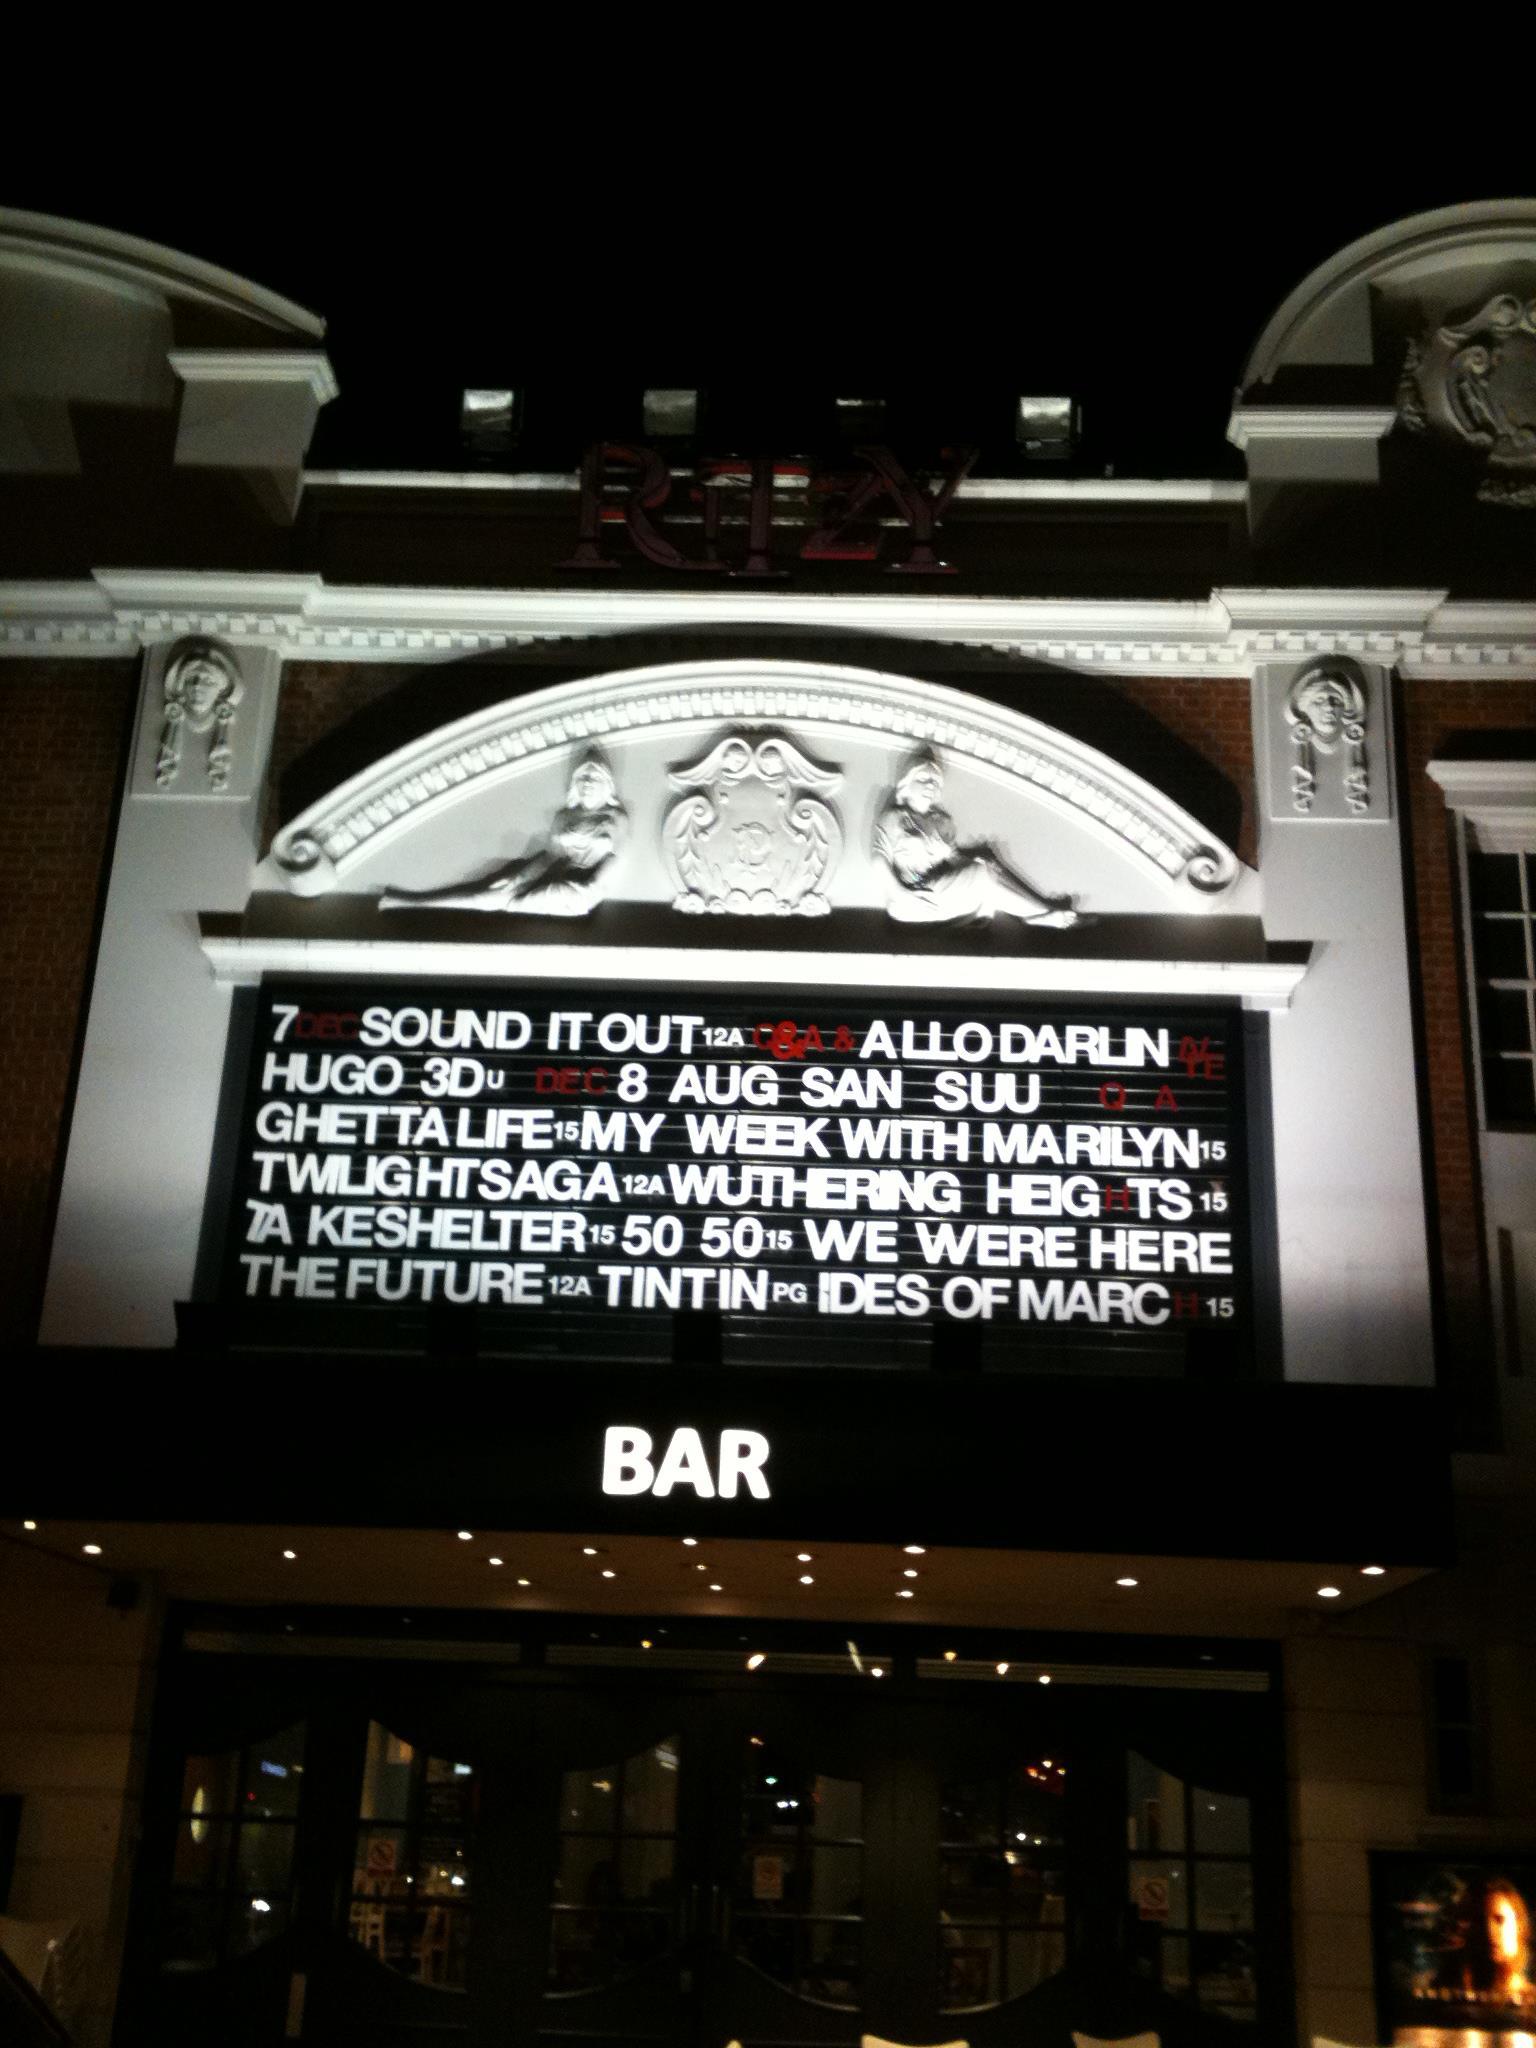 Screening at Brixton Ritzy with Allo Darlin' live